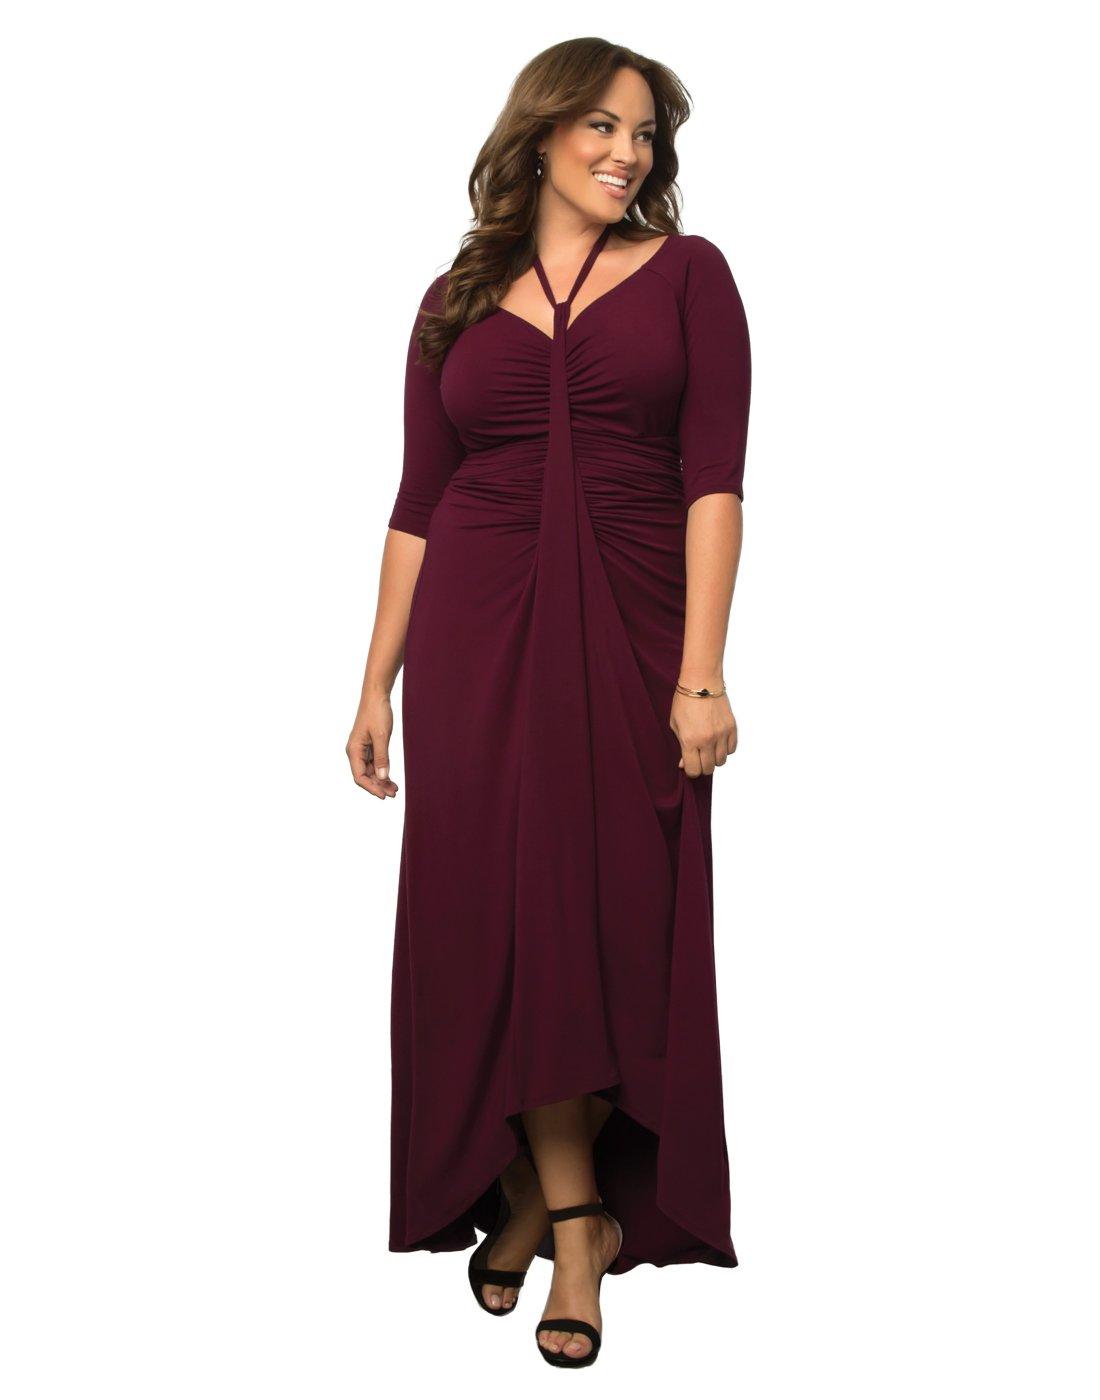 Kiyonna Women's Plus Size Divine Draped Maxi Dress 1X Raspberry Wine